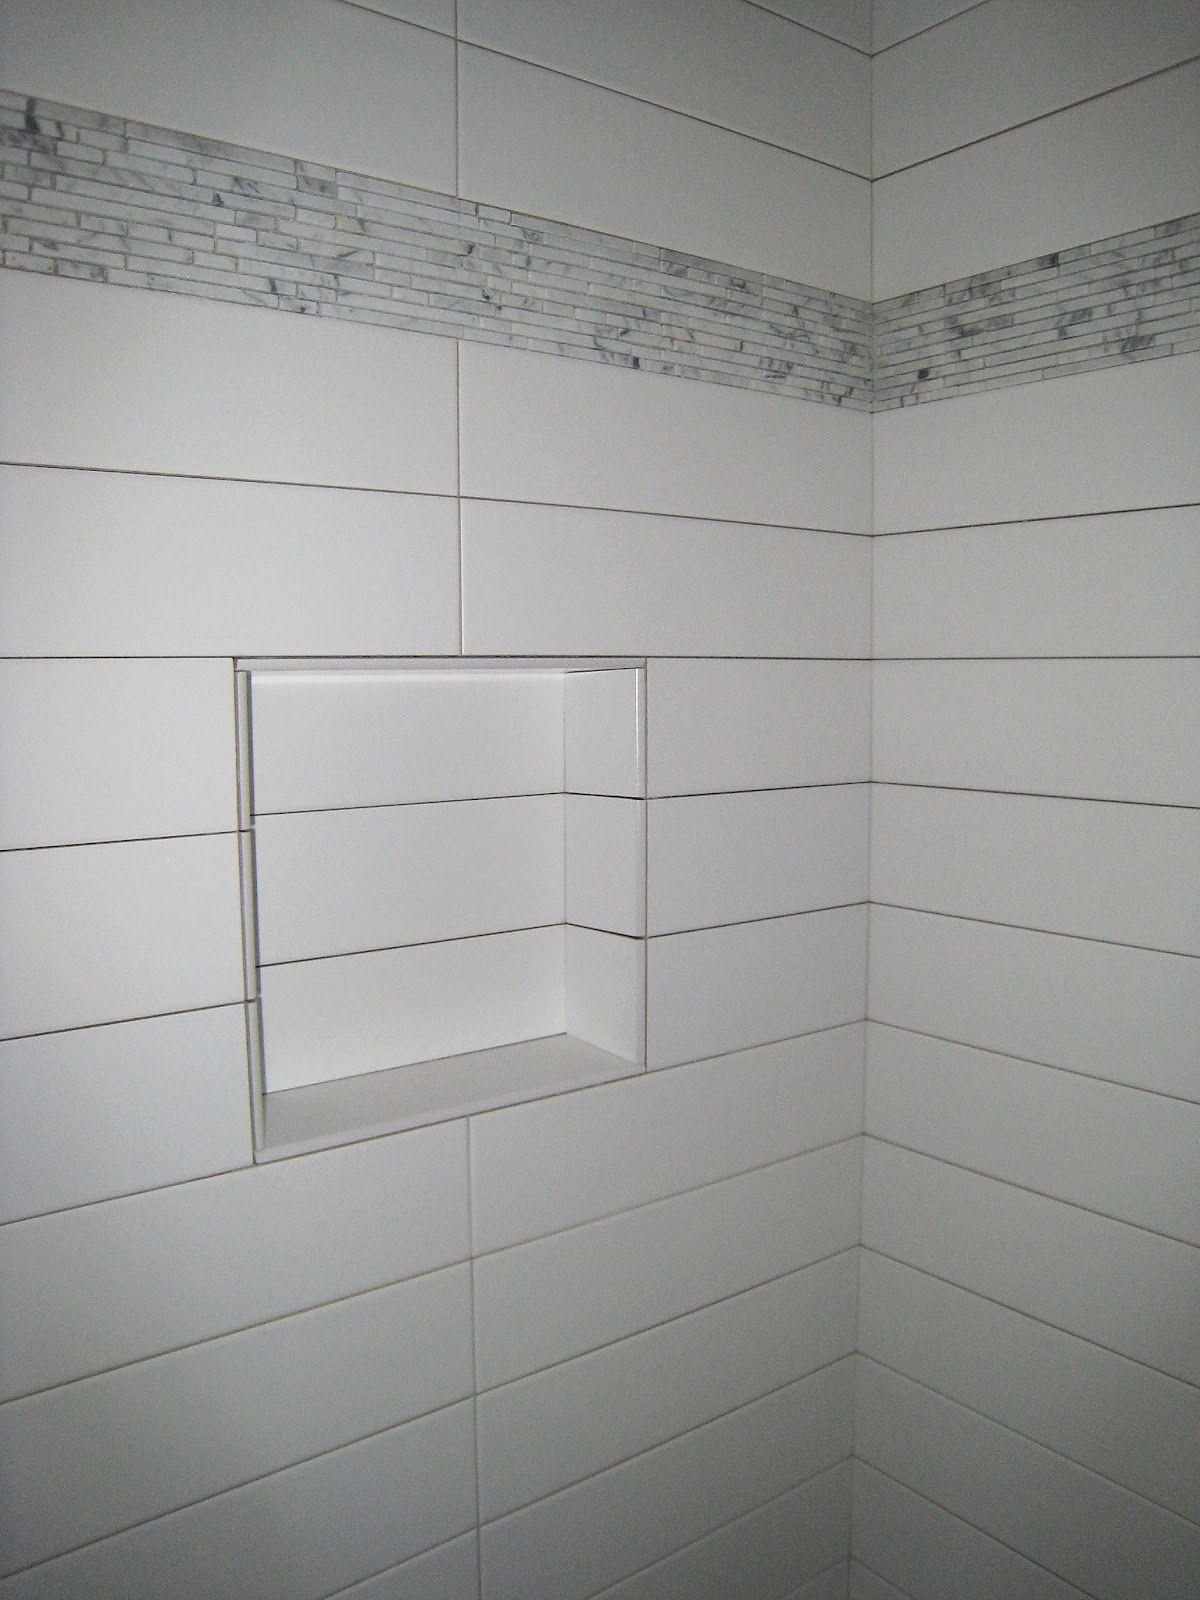 Subway Tile Stacked Or Brick Pattern Patterned Bathroom Tiles